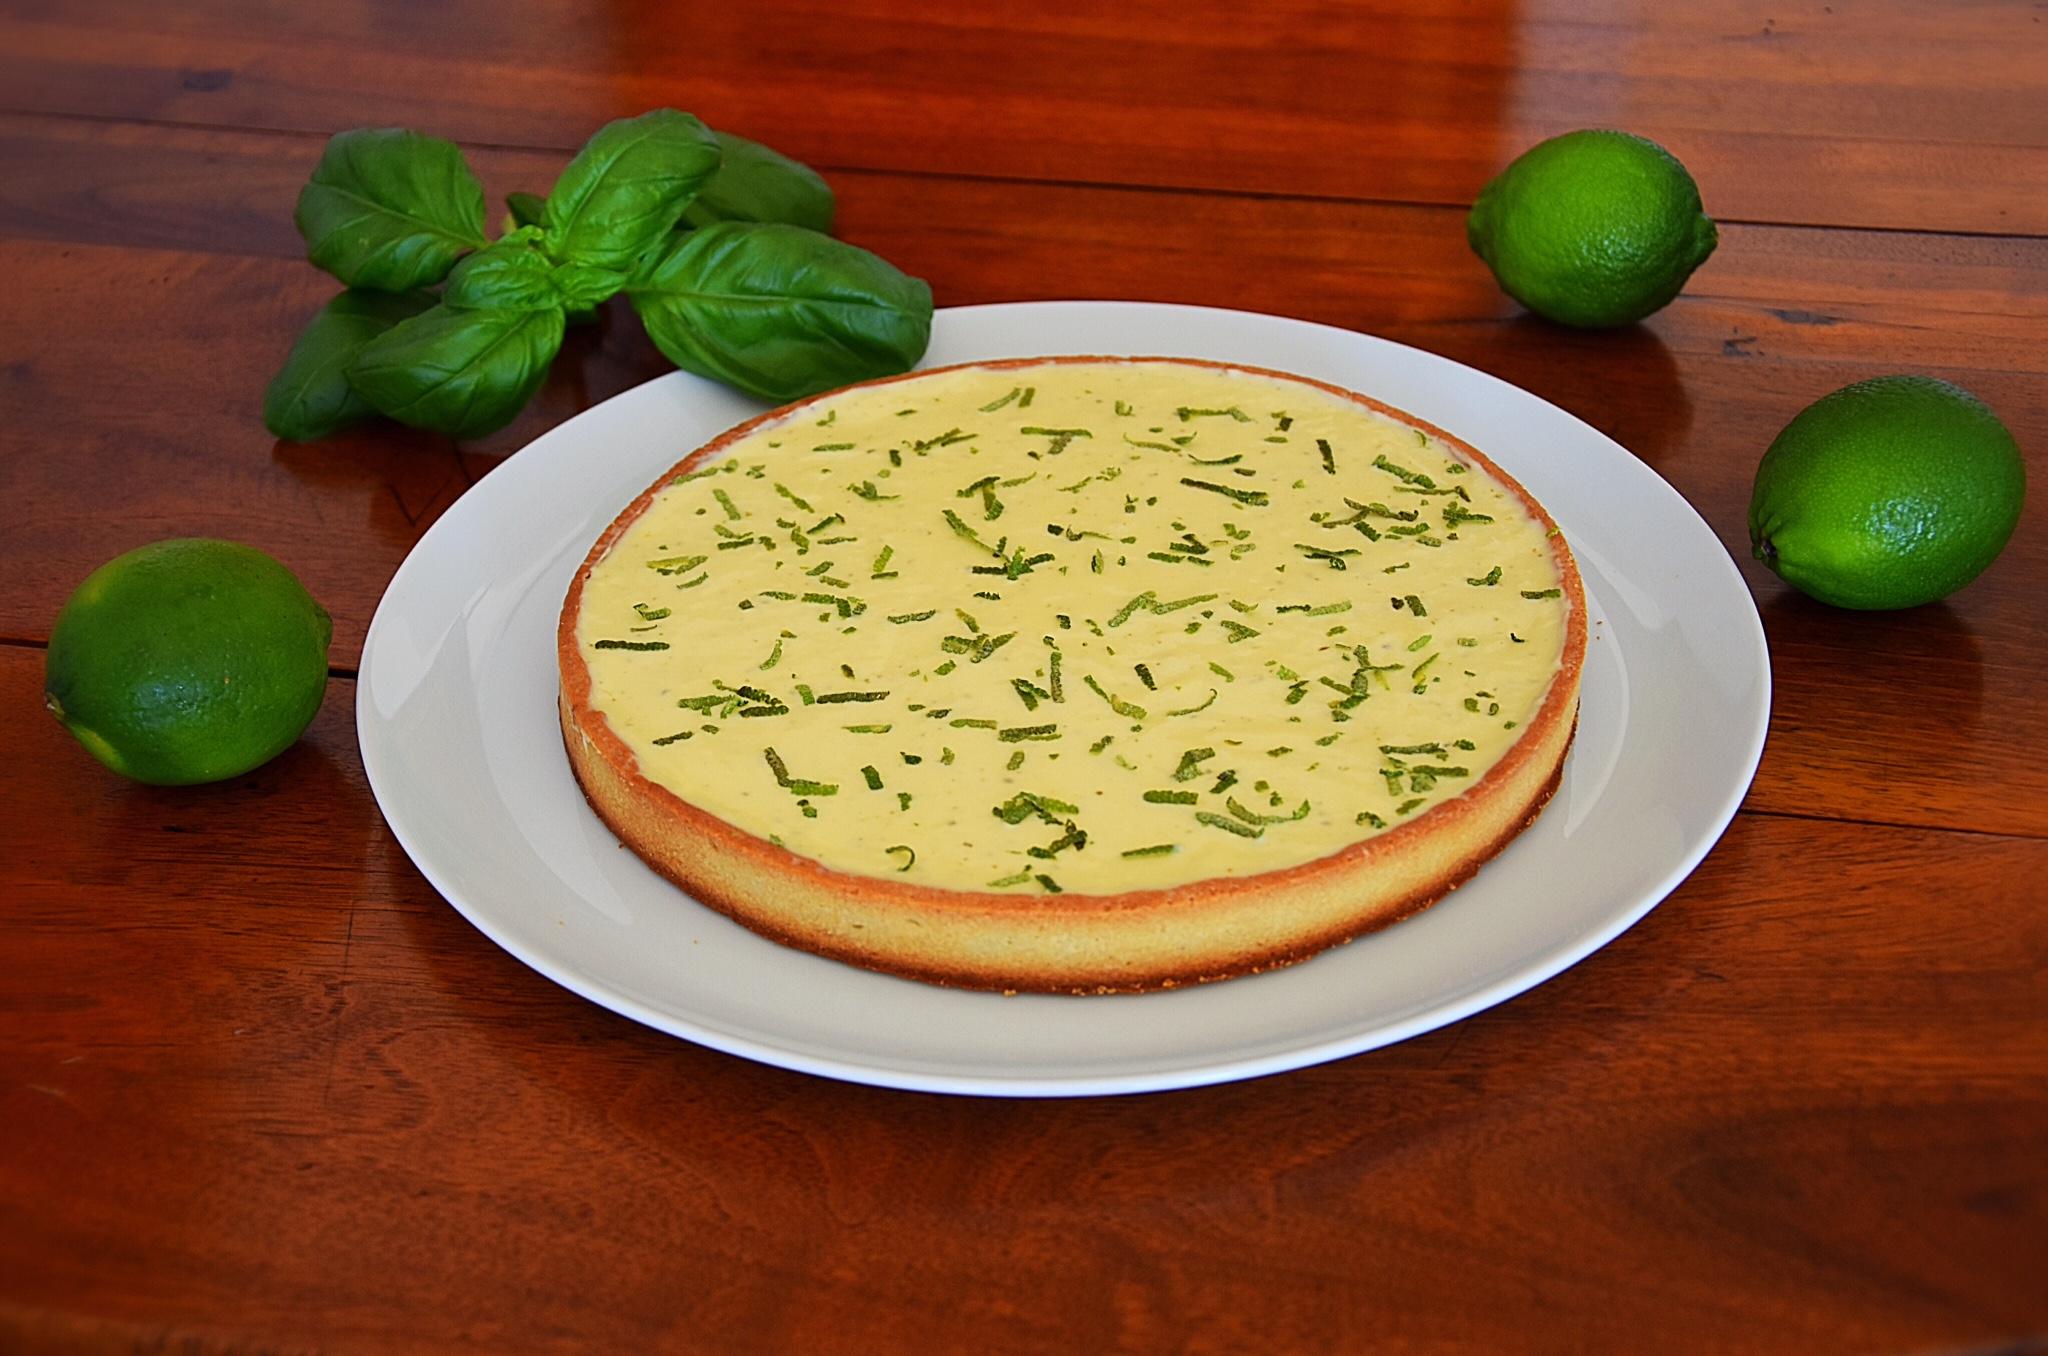 Tarte citron vert - basilic (Jacques Genin)